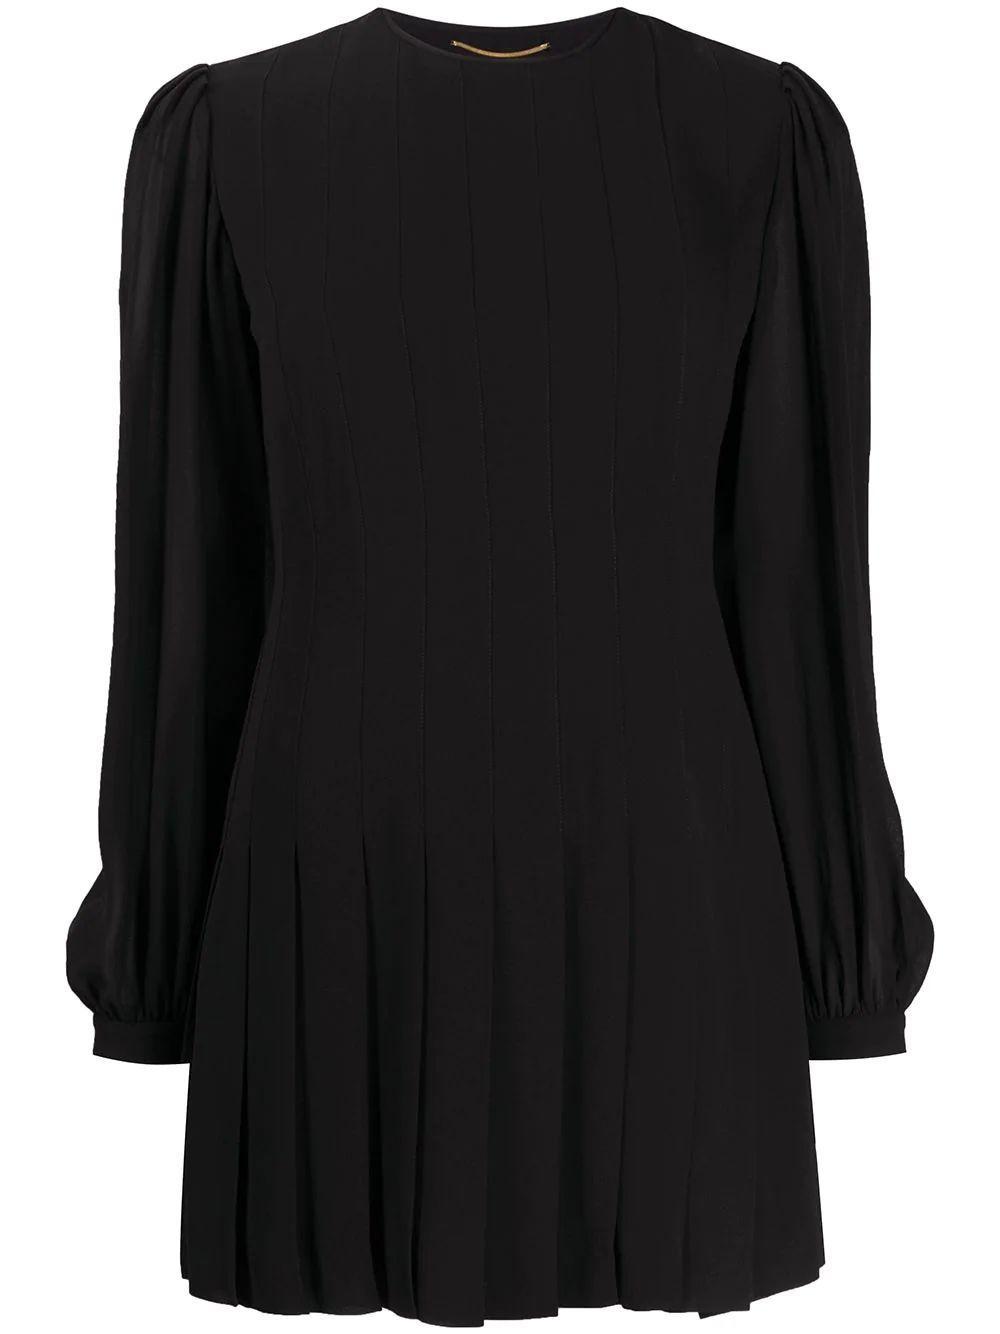 Long Sleeve Crepe Short Dress Item # 608954Y103W